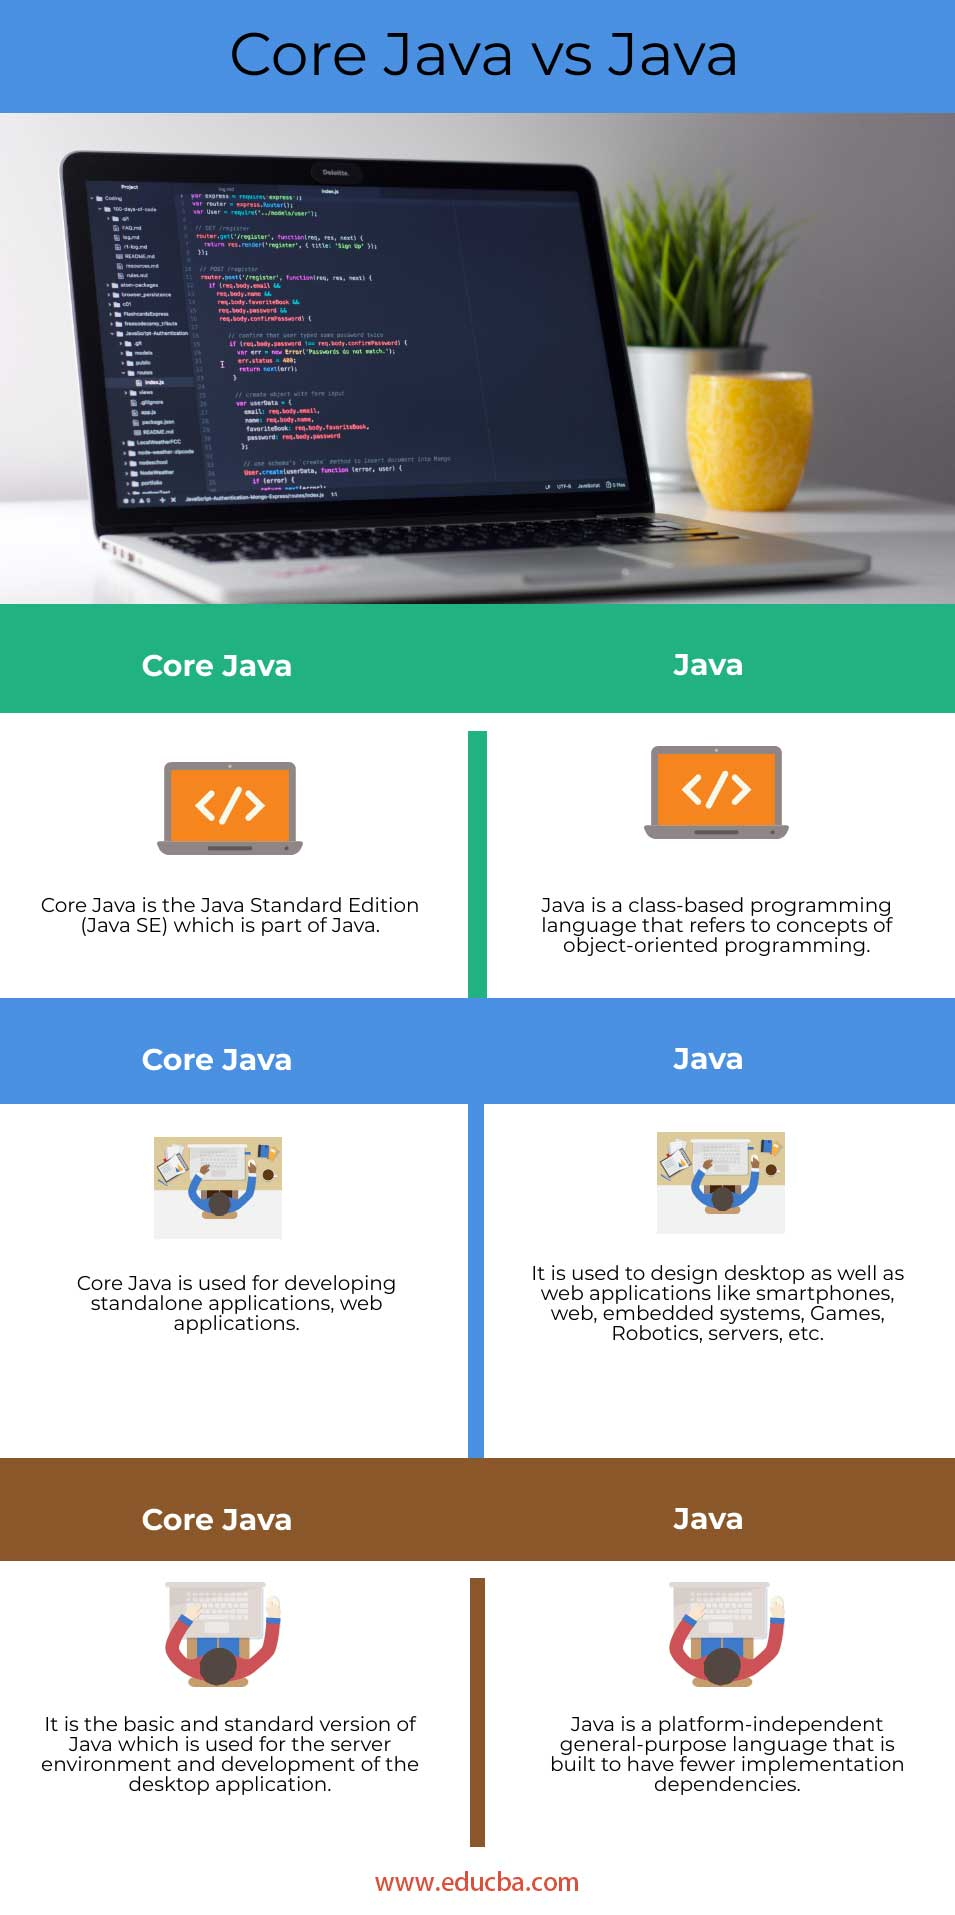 Core-Java-vs-Java-info